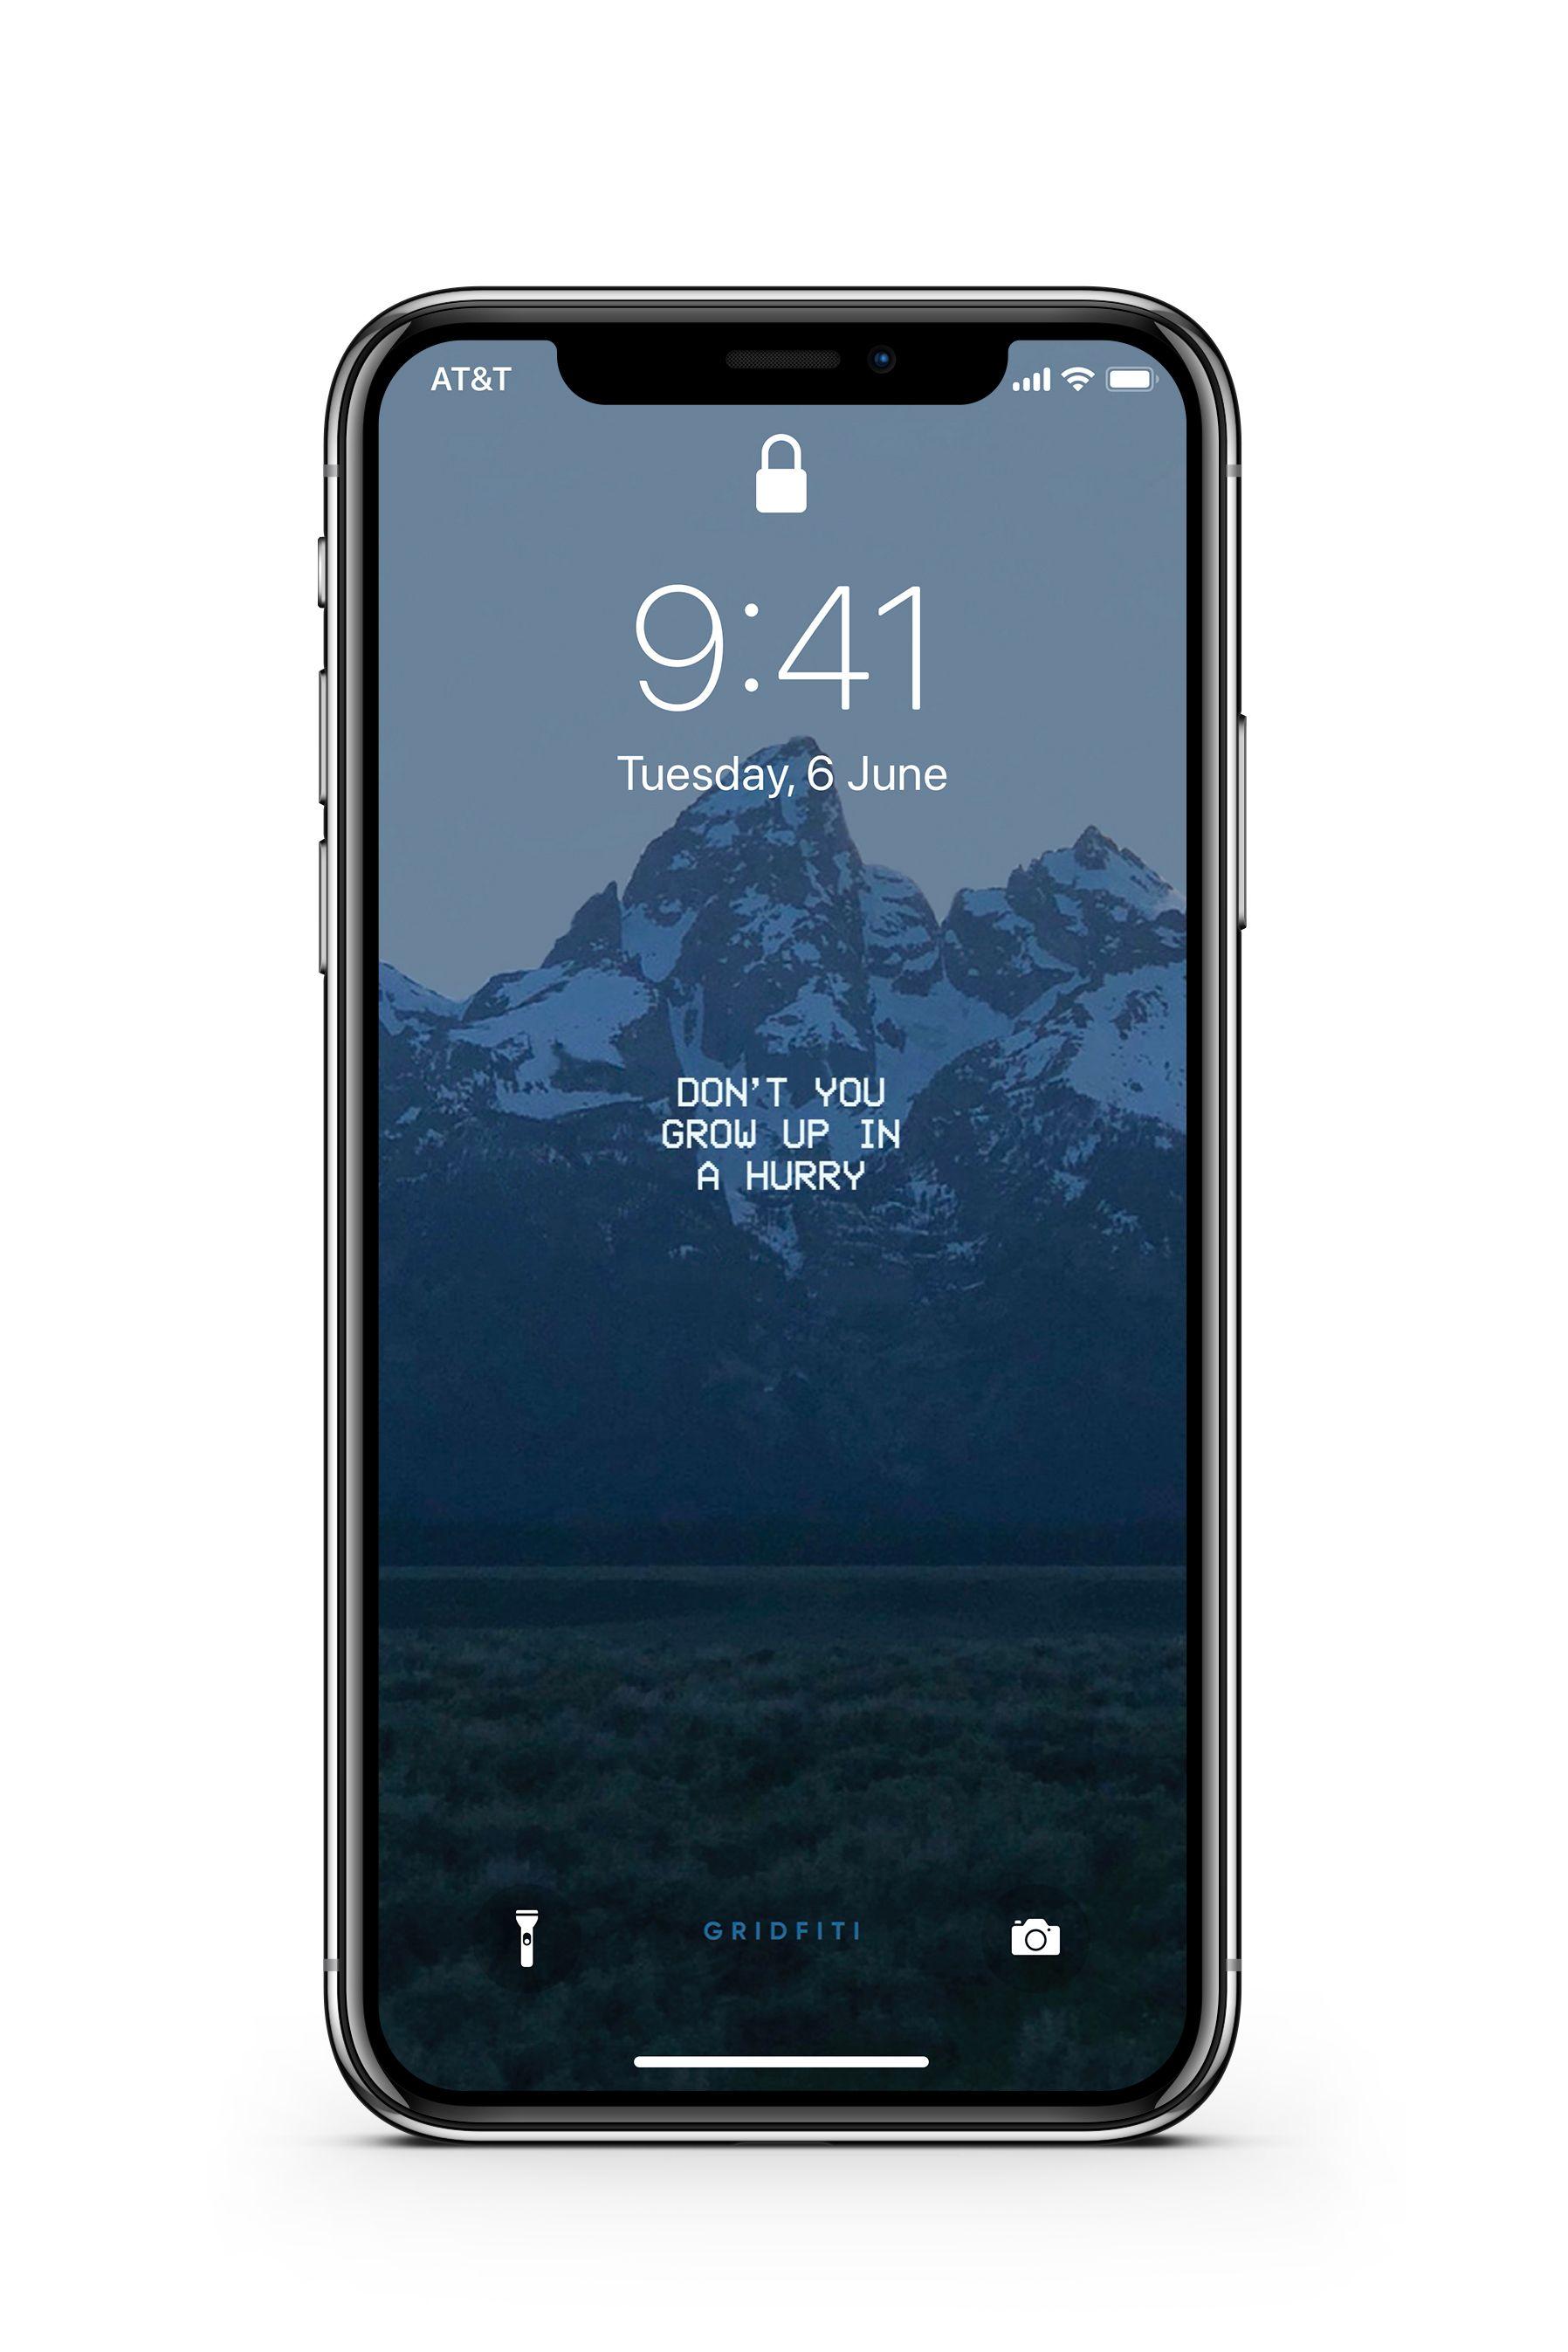 Kanye West Wyoming Wallpaper Top Yeezy Phone Backgrounds In 2020 Kanye West Wallpaper Kanye West Songs Kanye West Background